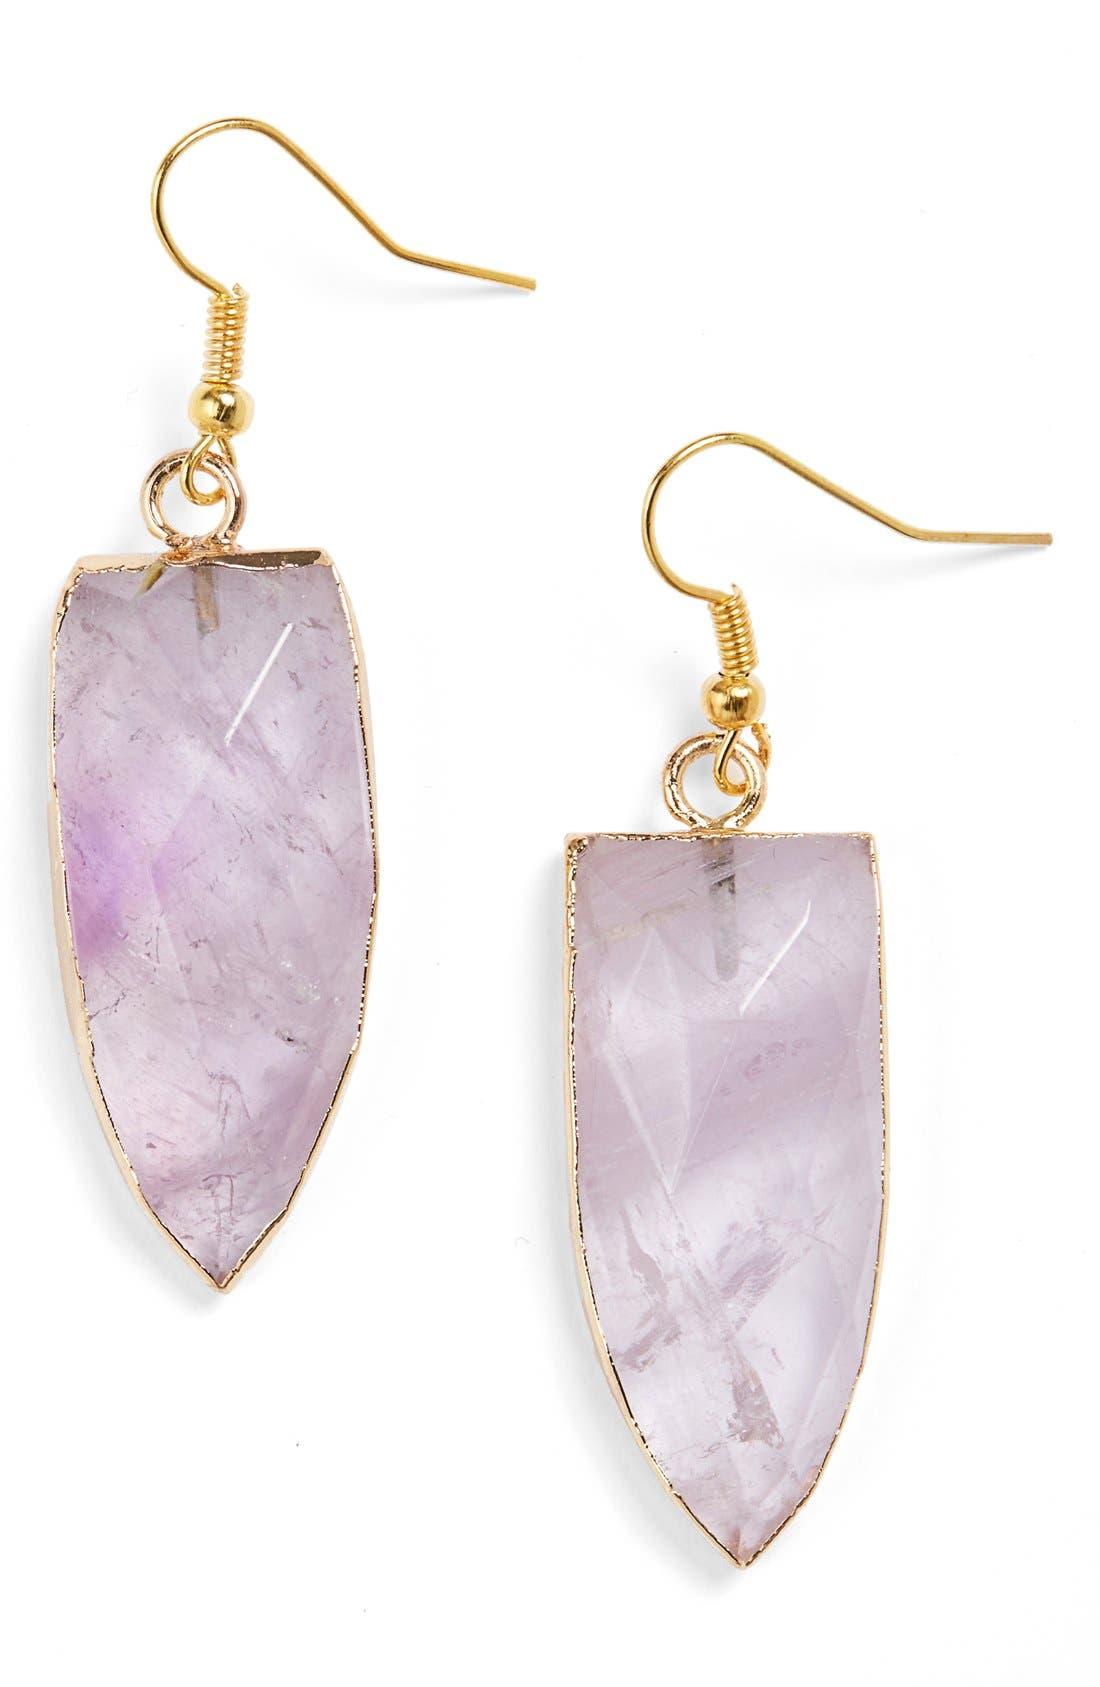 Main Image - Panacea Pendant Earrings